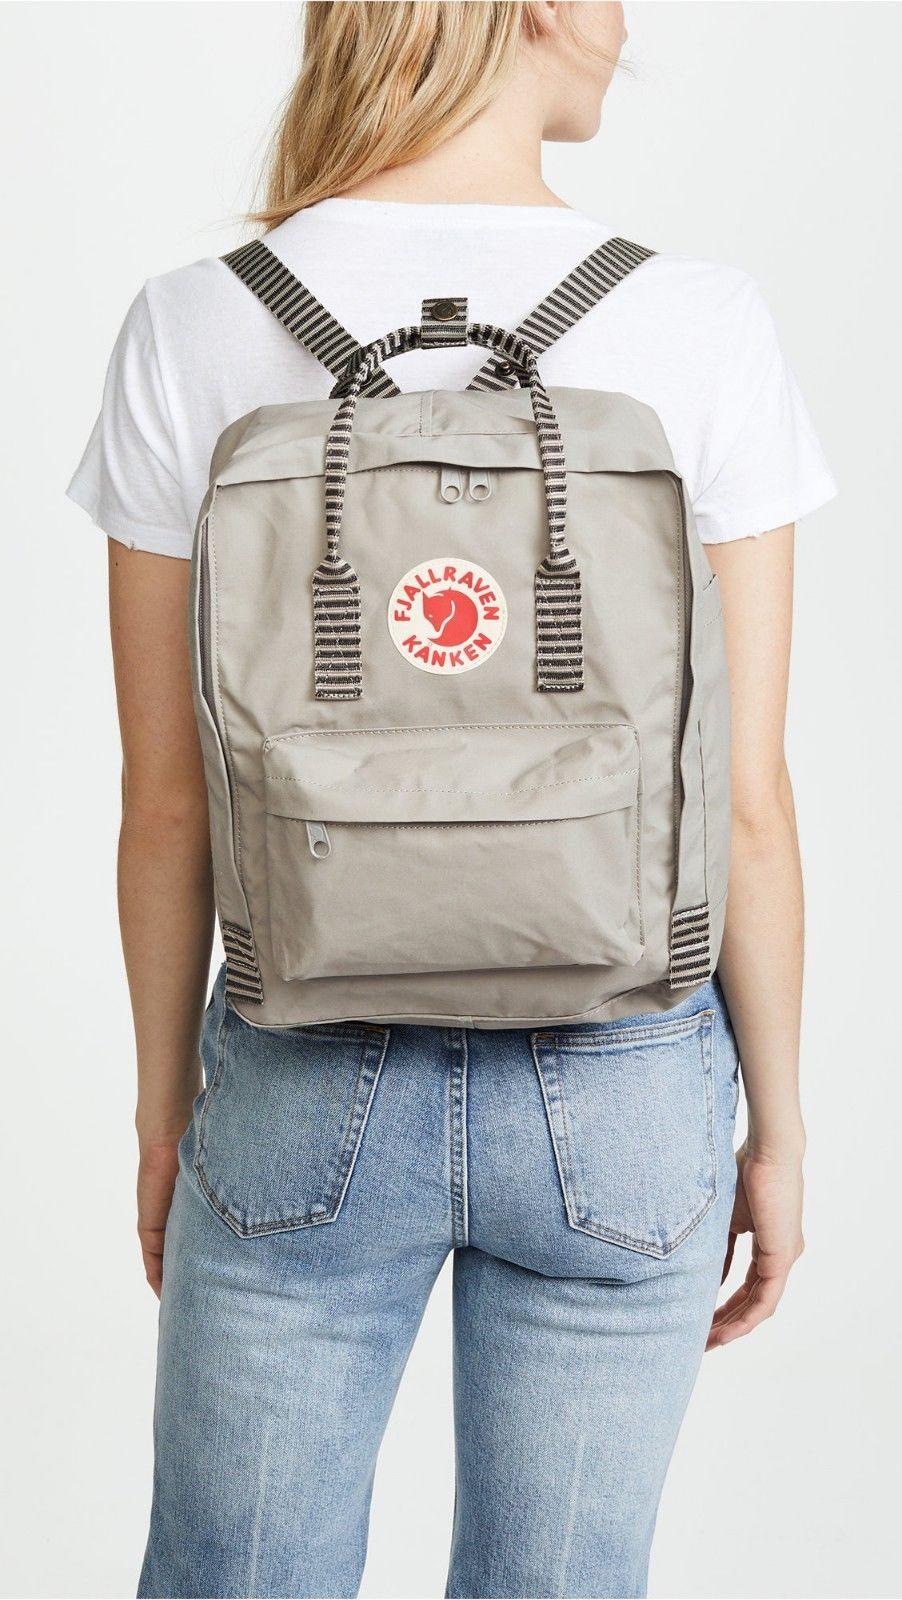 16L/Classic BackPack Brand School Bag Travel Fog Grey